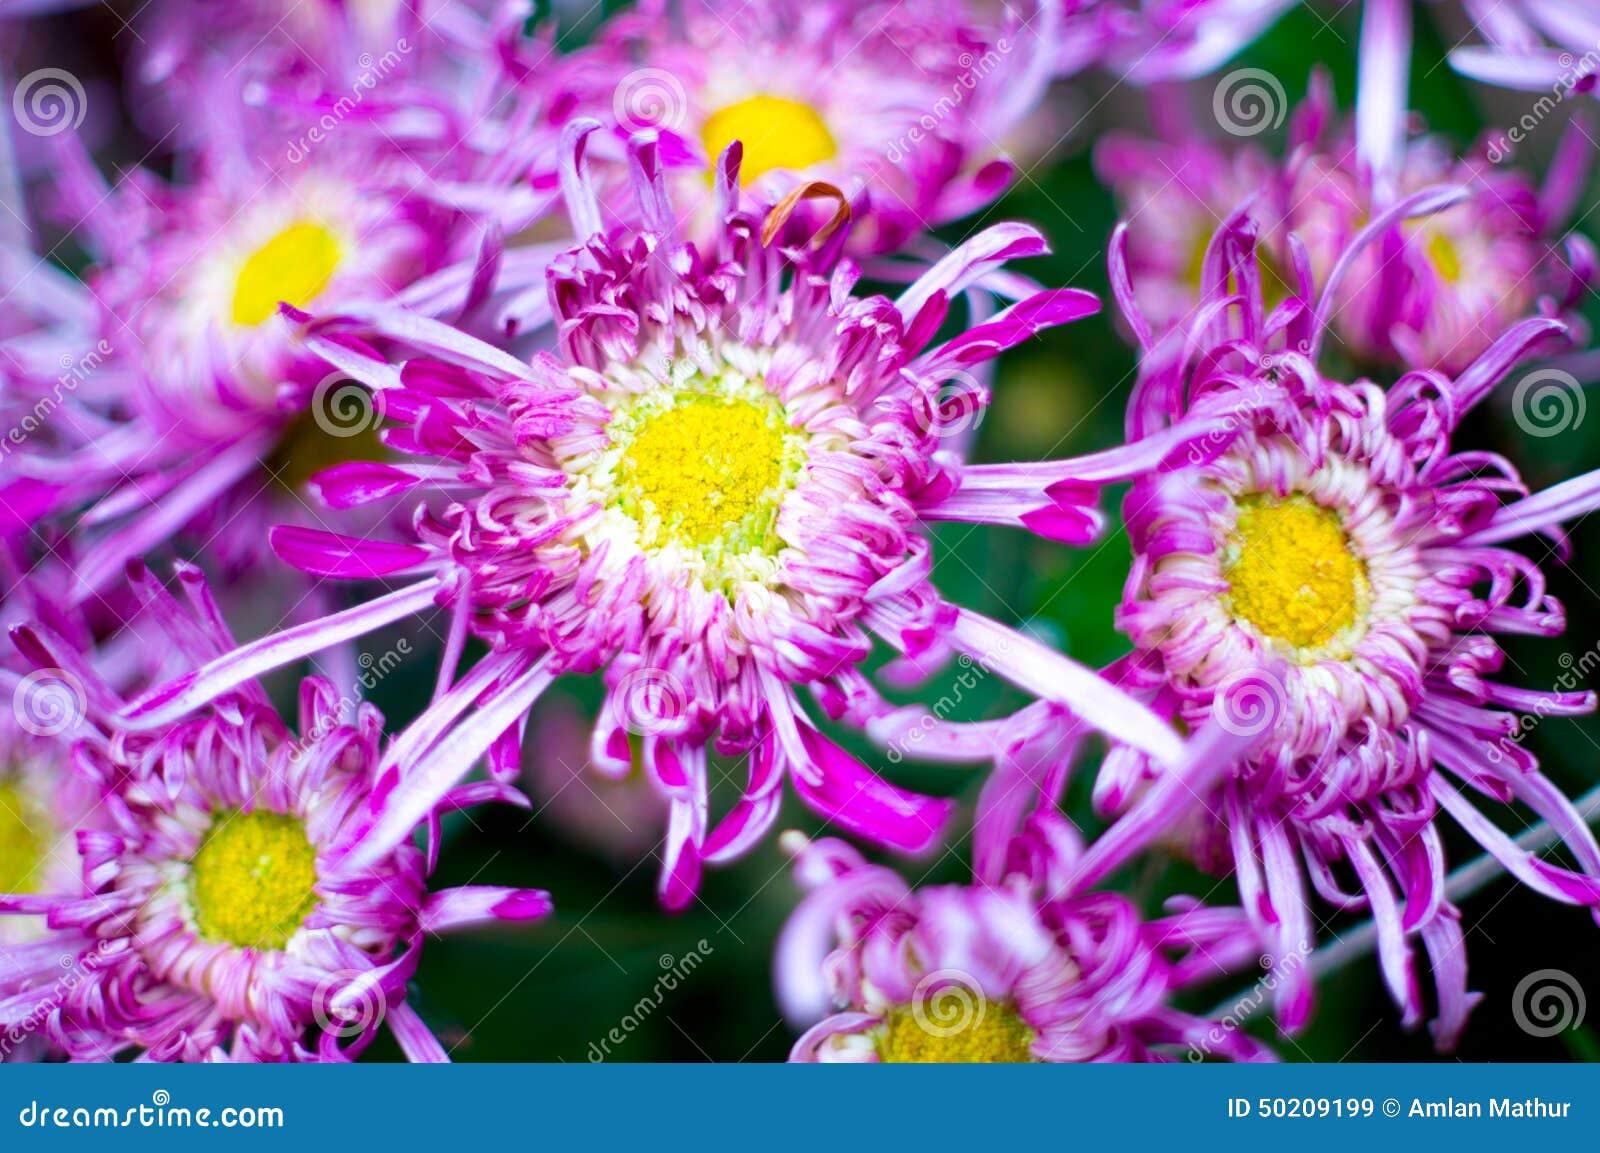 Beautiful Purple Yellow Flowers Blooming In Spring Stock ...